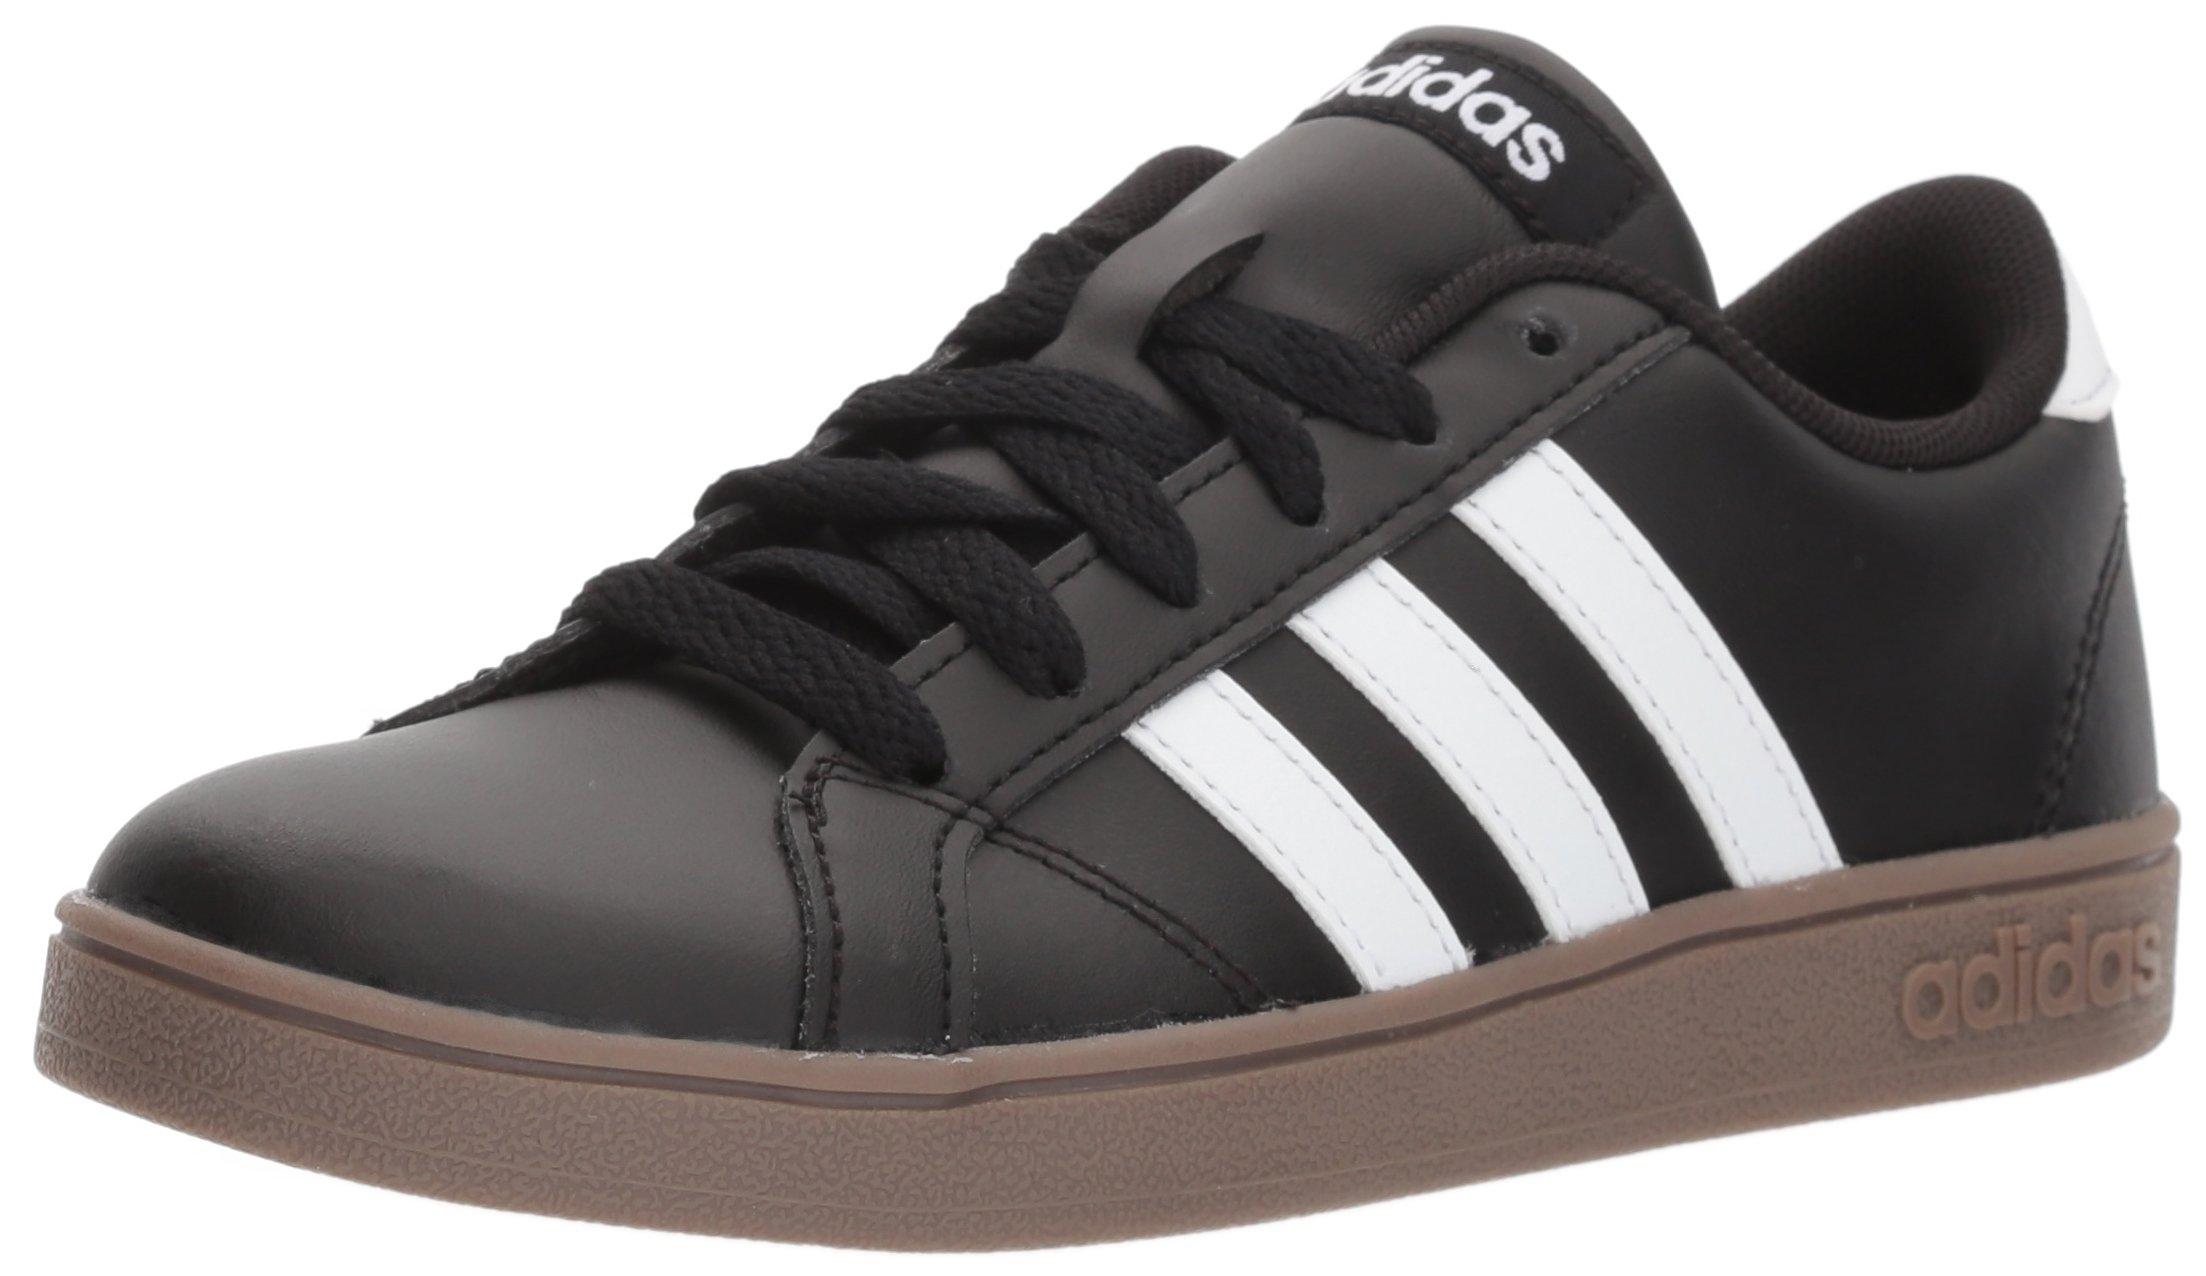 adidas Unisex-Kids Baseline Sneaker, Black/White/Gum, 7 M US Big Kid